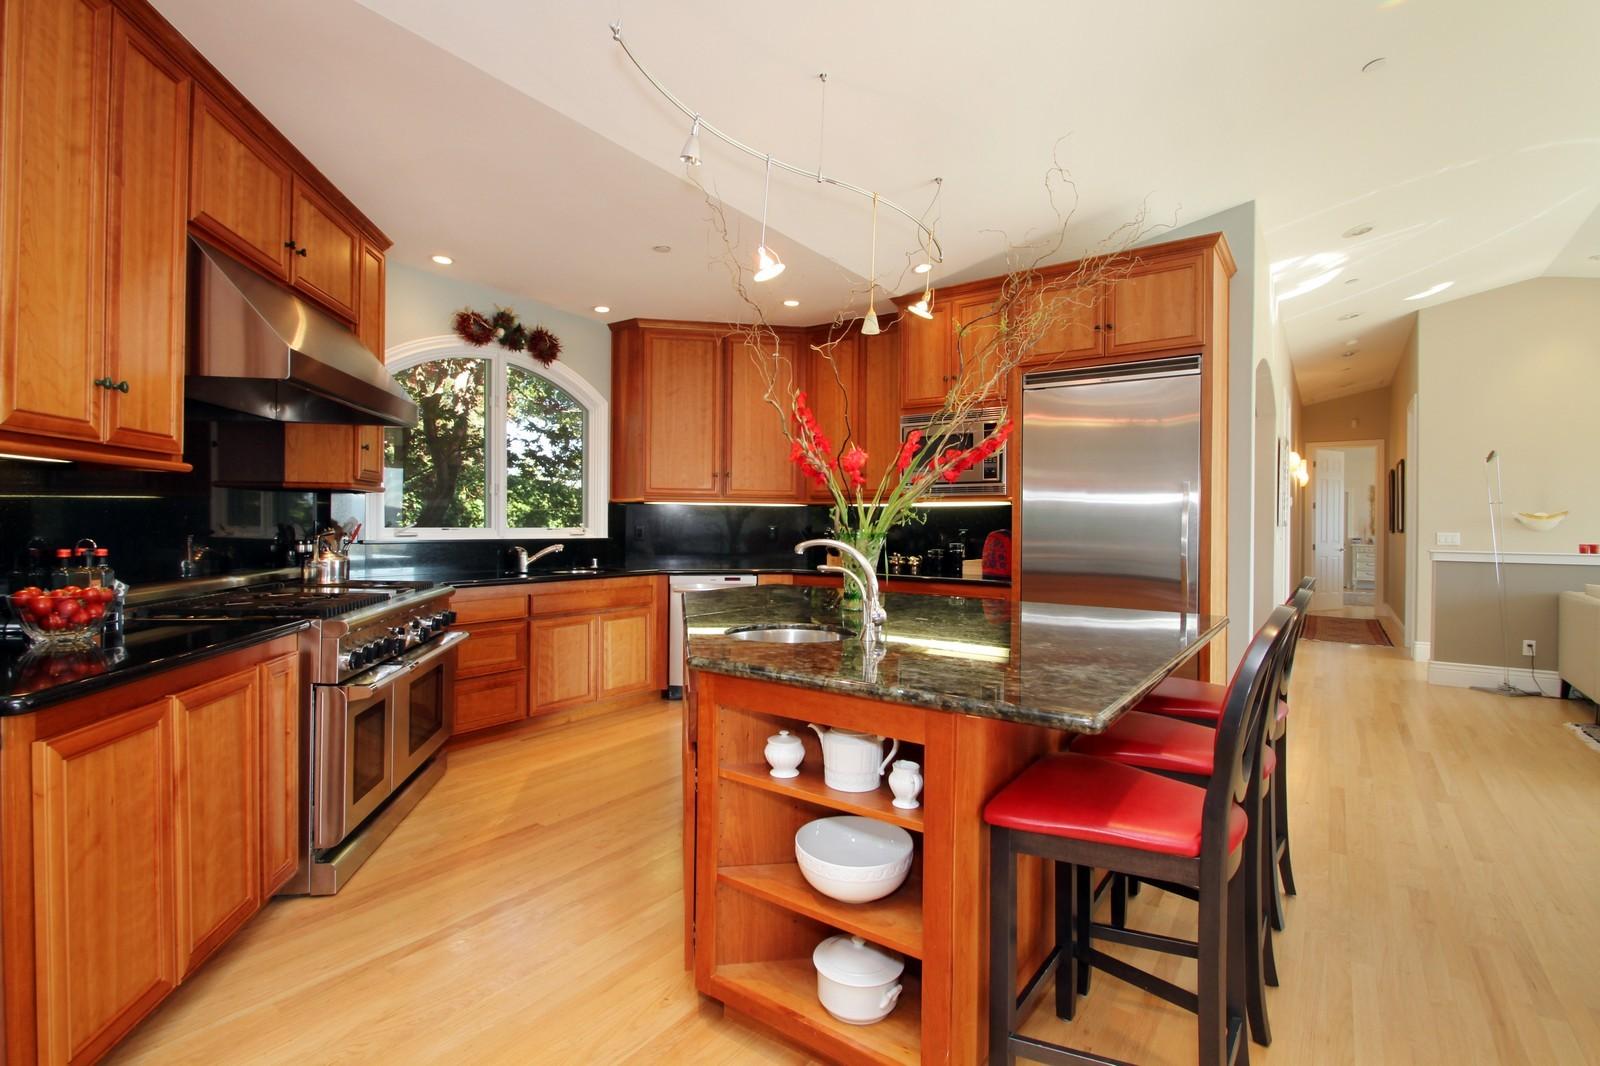 Real Estate Photography - 73 Upper Toyon Drive, Kentfield, CA, 94904 - Kitchen